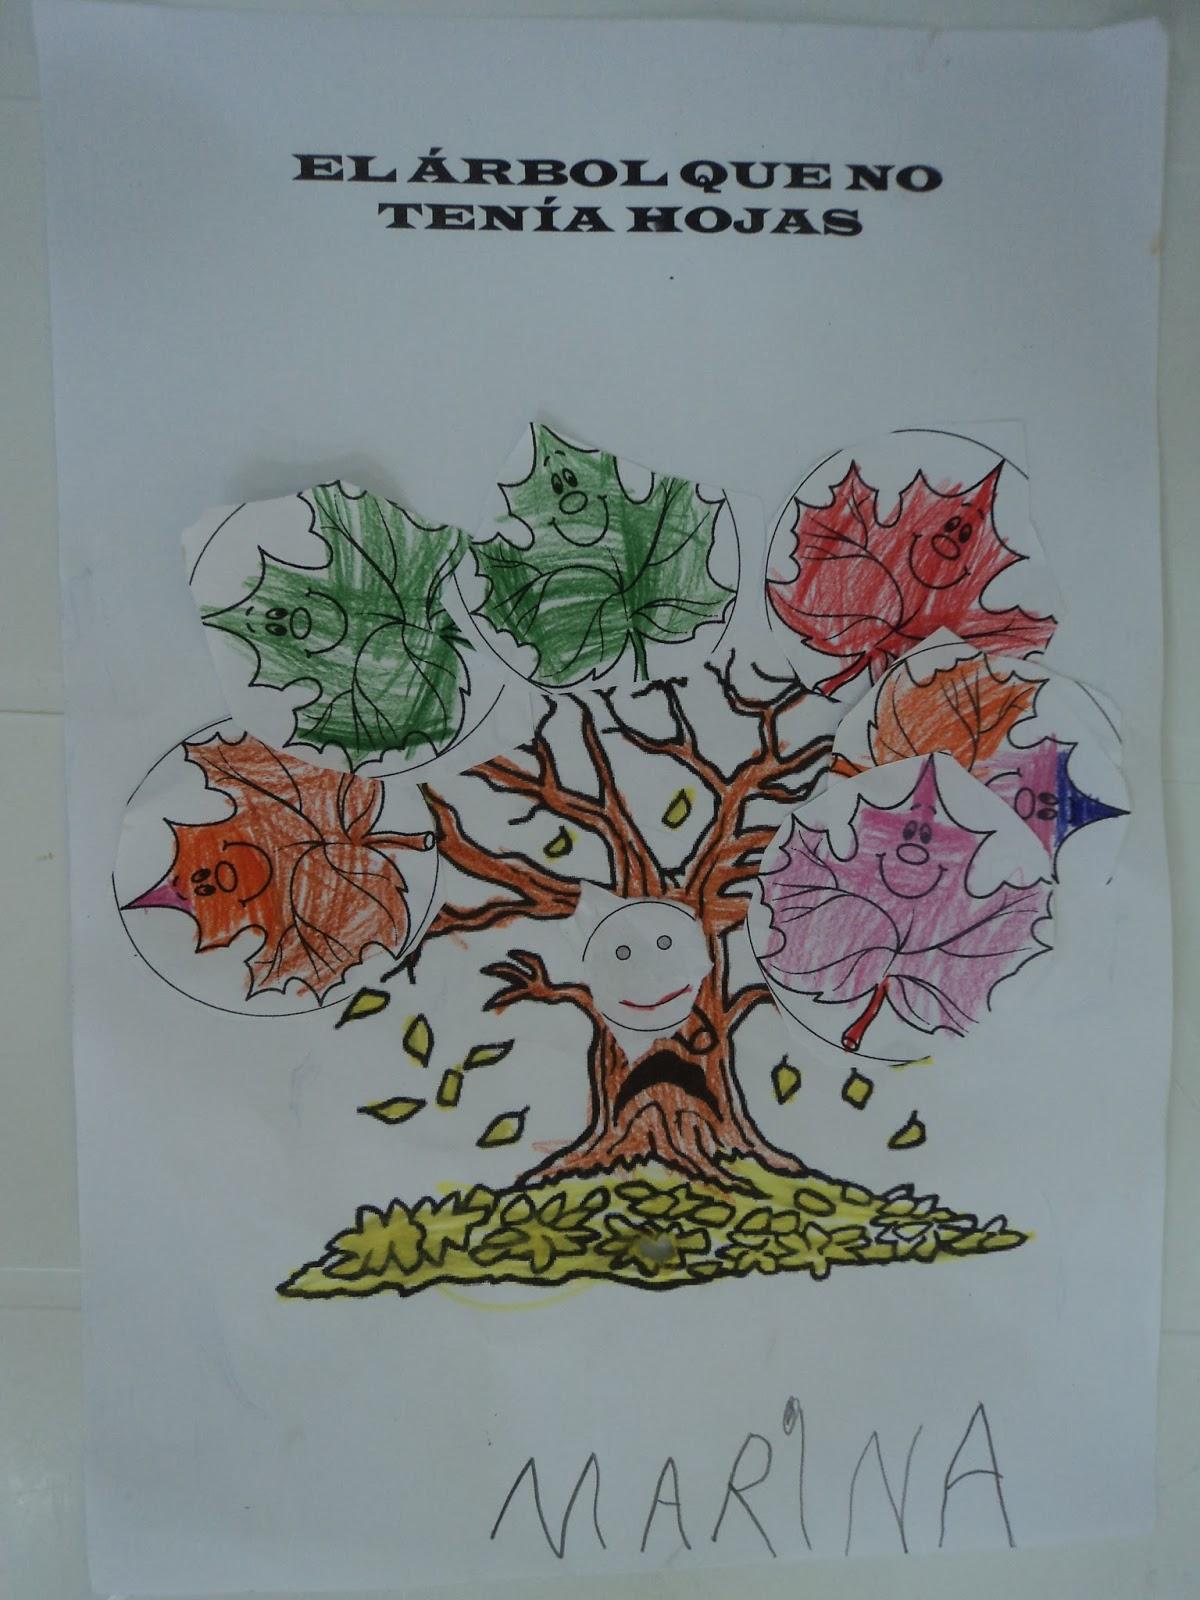 Infantil goya fiesta de oto o infantil 2015 for El arbol que no tiene hojas